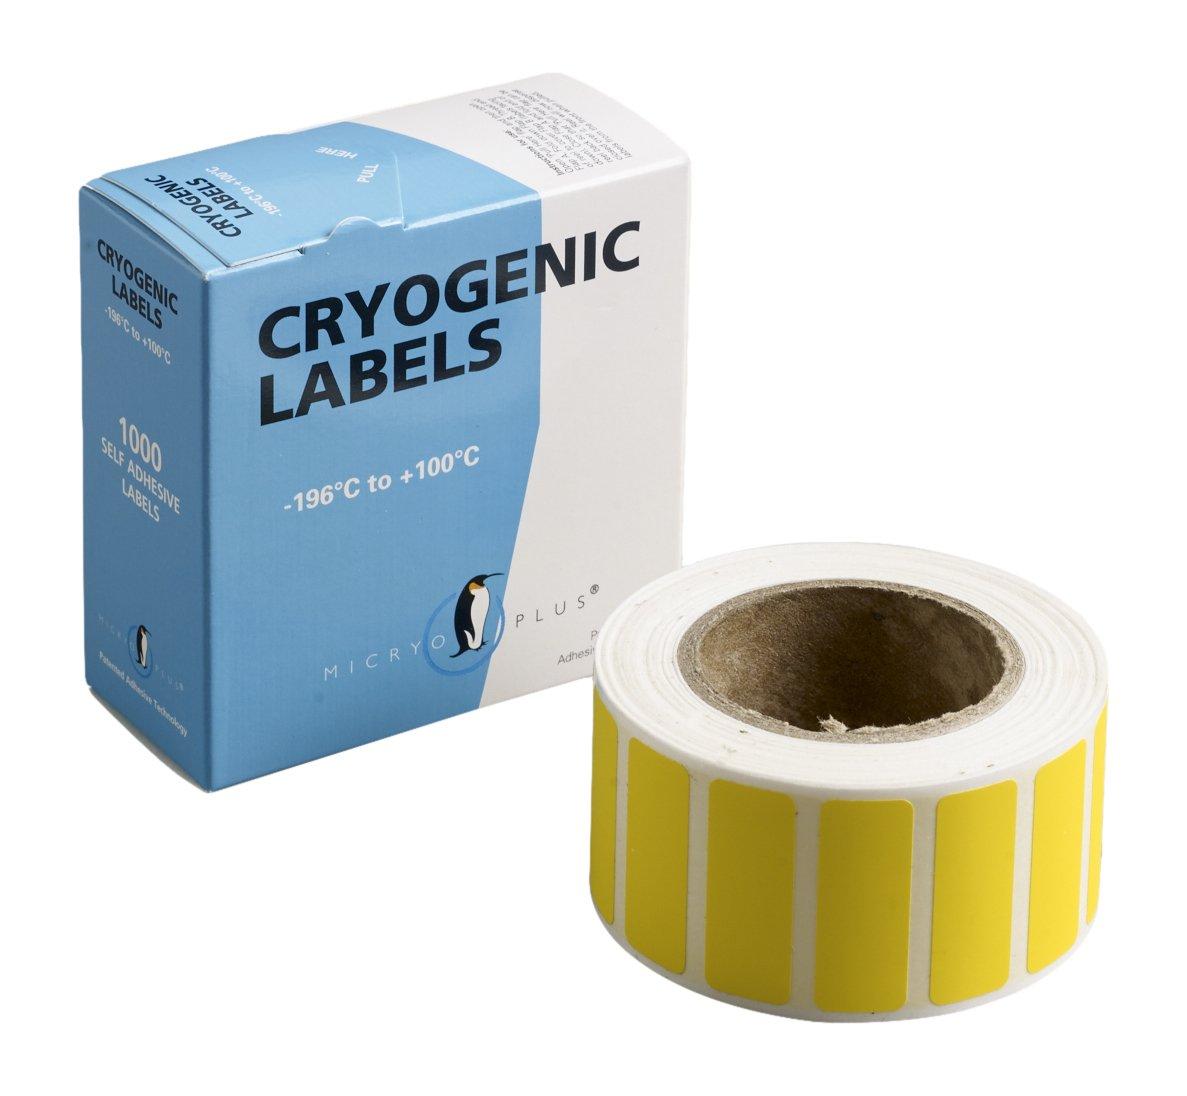 Camlab Plastics RTP/177 Tubee's Strips, 33 x 13 mm, Reel, Micryo Yellow (Pack of 1000) 1146442